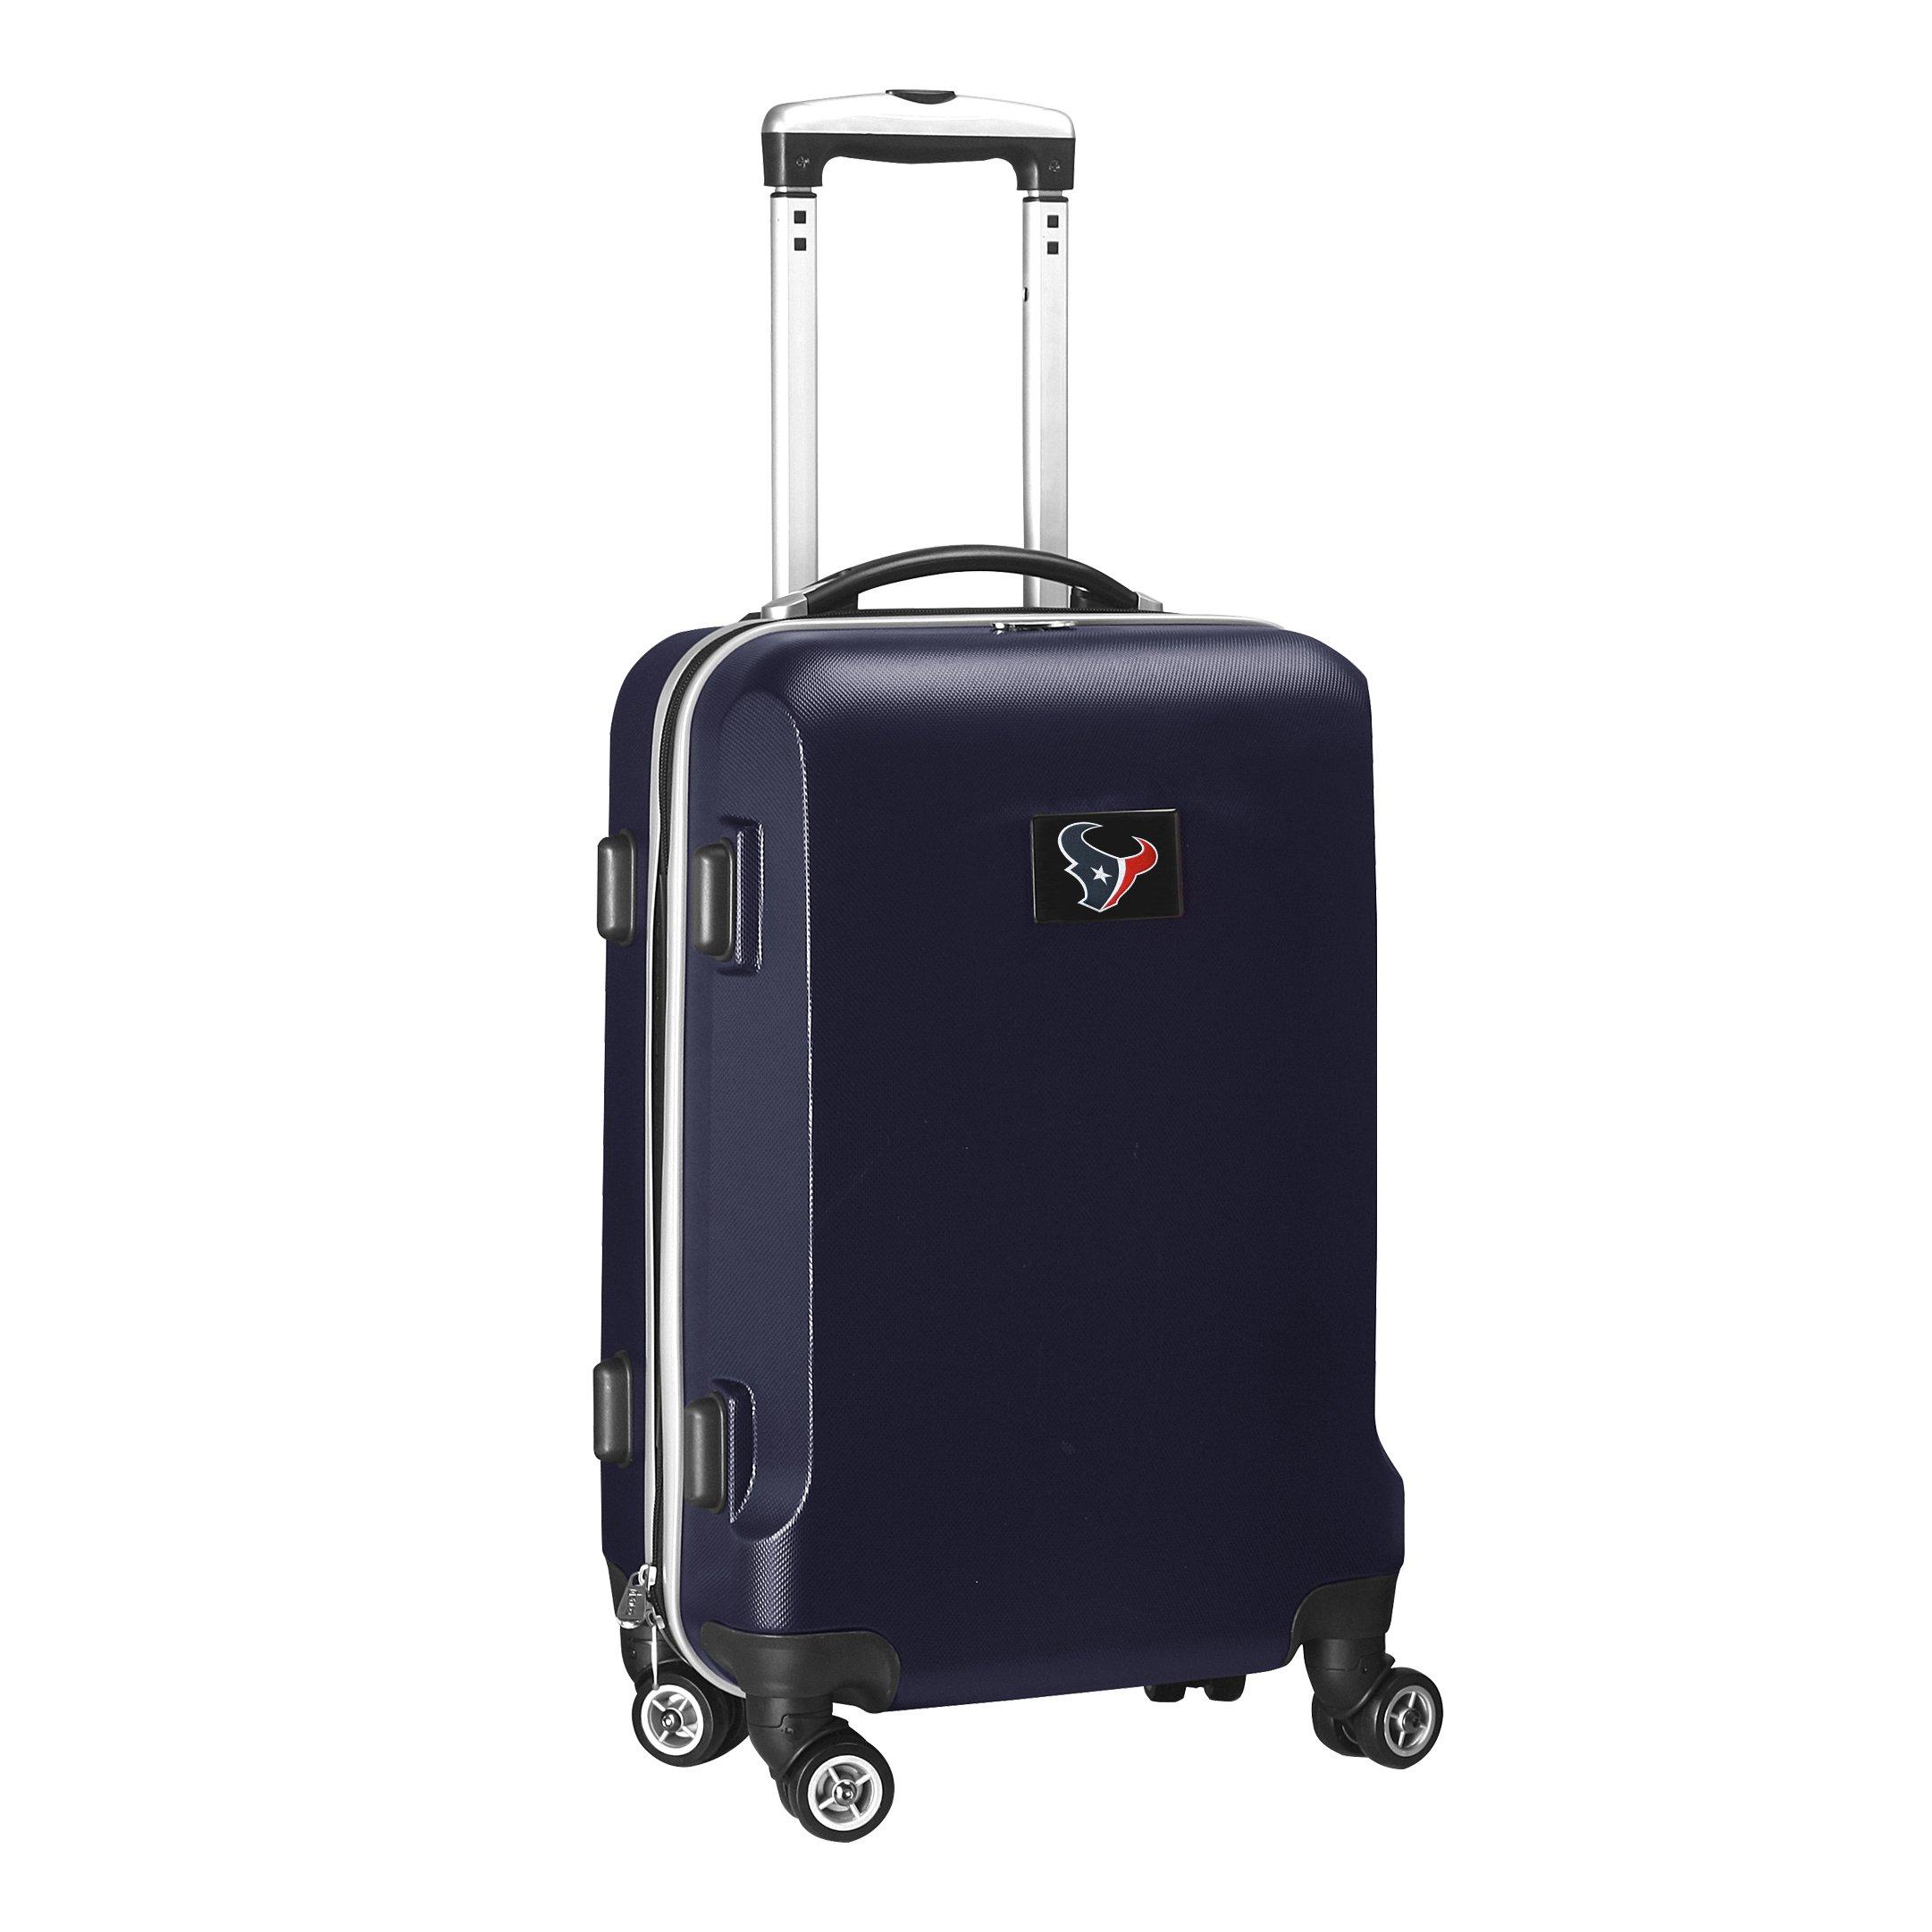 Denco NFL Houston Texans Carry-On Hardcase Luggage Spinner, Navy by Denco (Image #2)